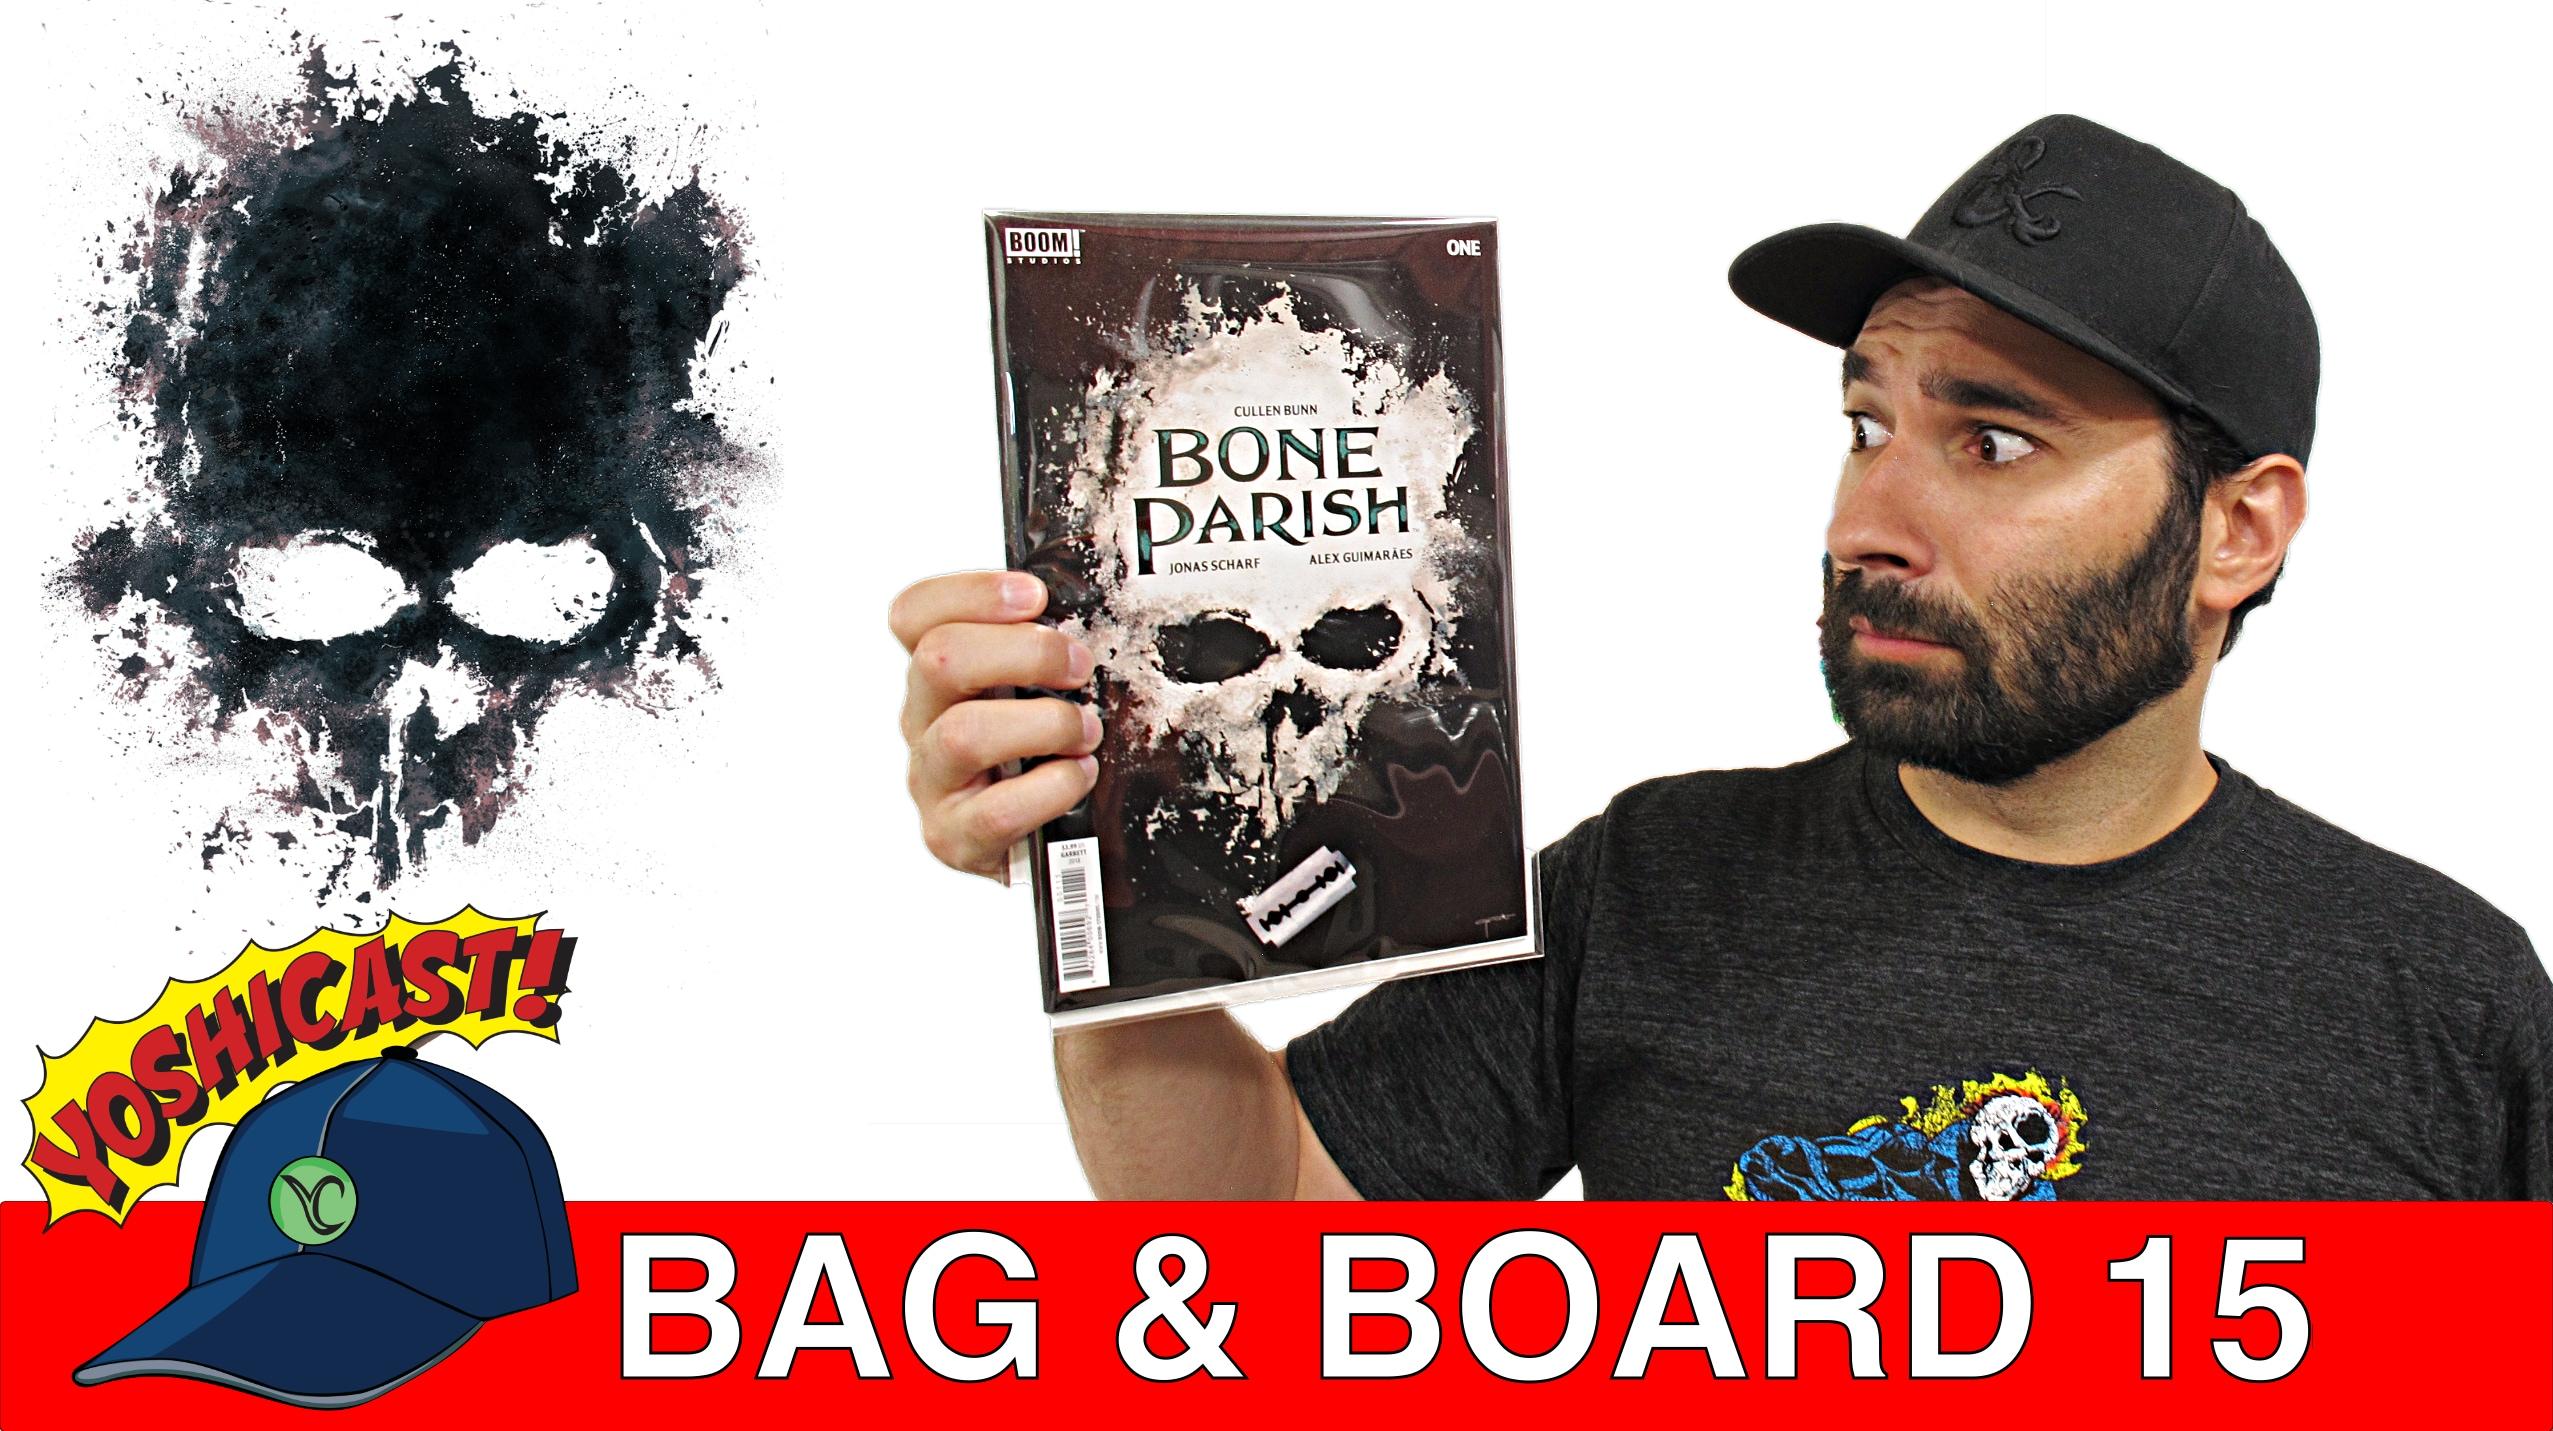 Bag & Board 15 | Bone Parish, Venom, Fantastic Four, X-Men, Spider-Man